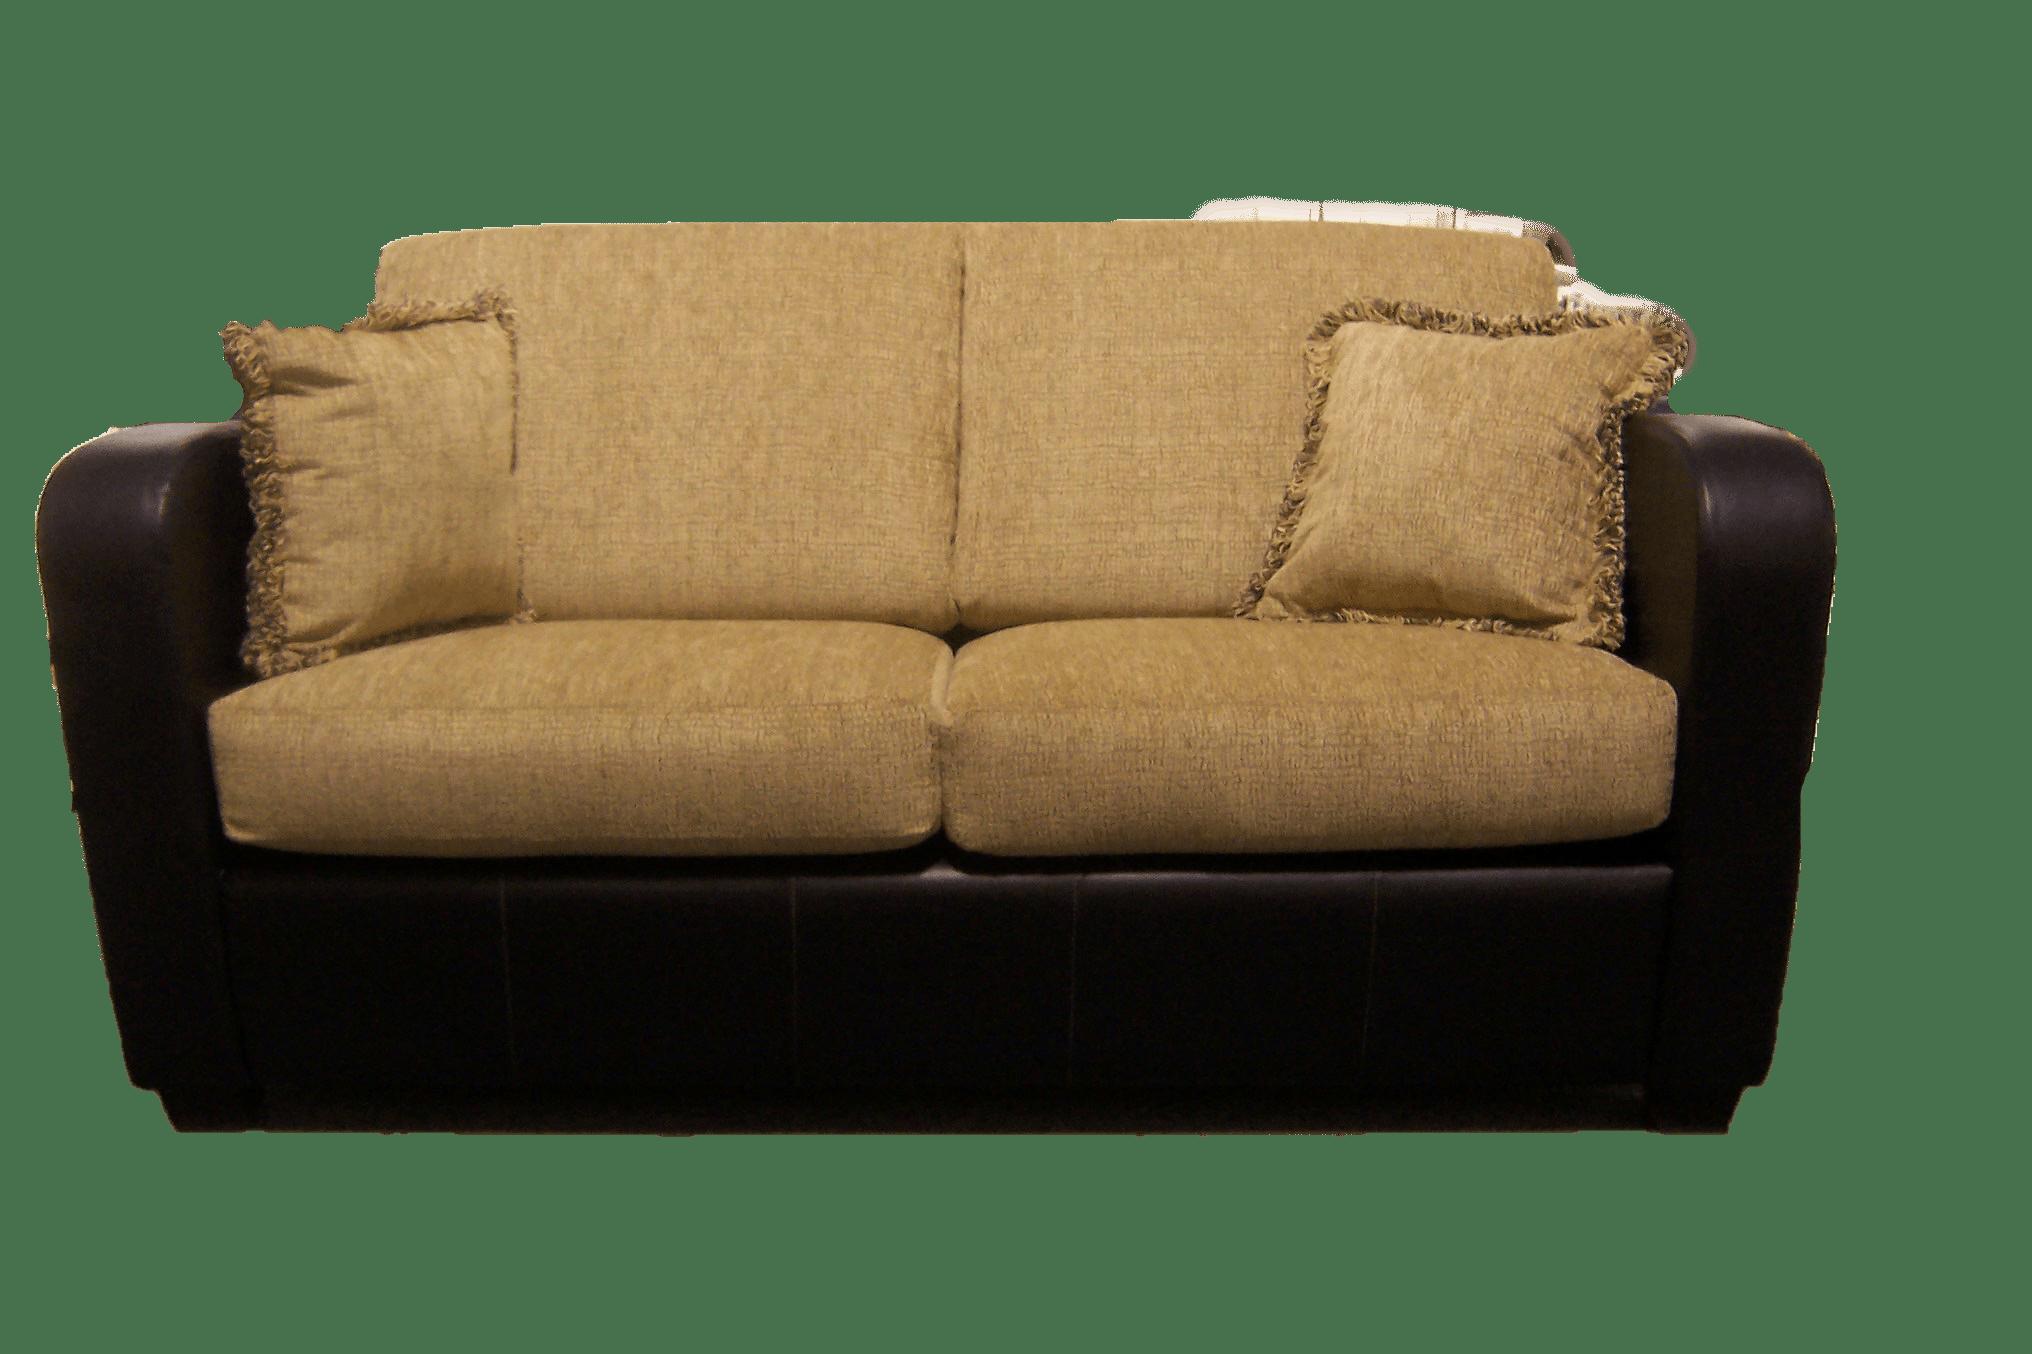 sofa set png images bobkona sectional reversible assembly free download